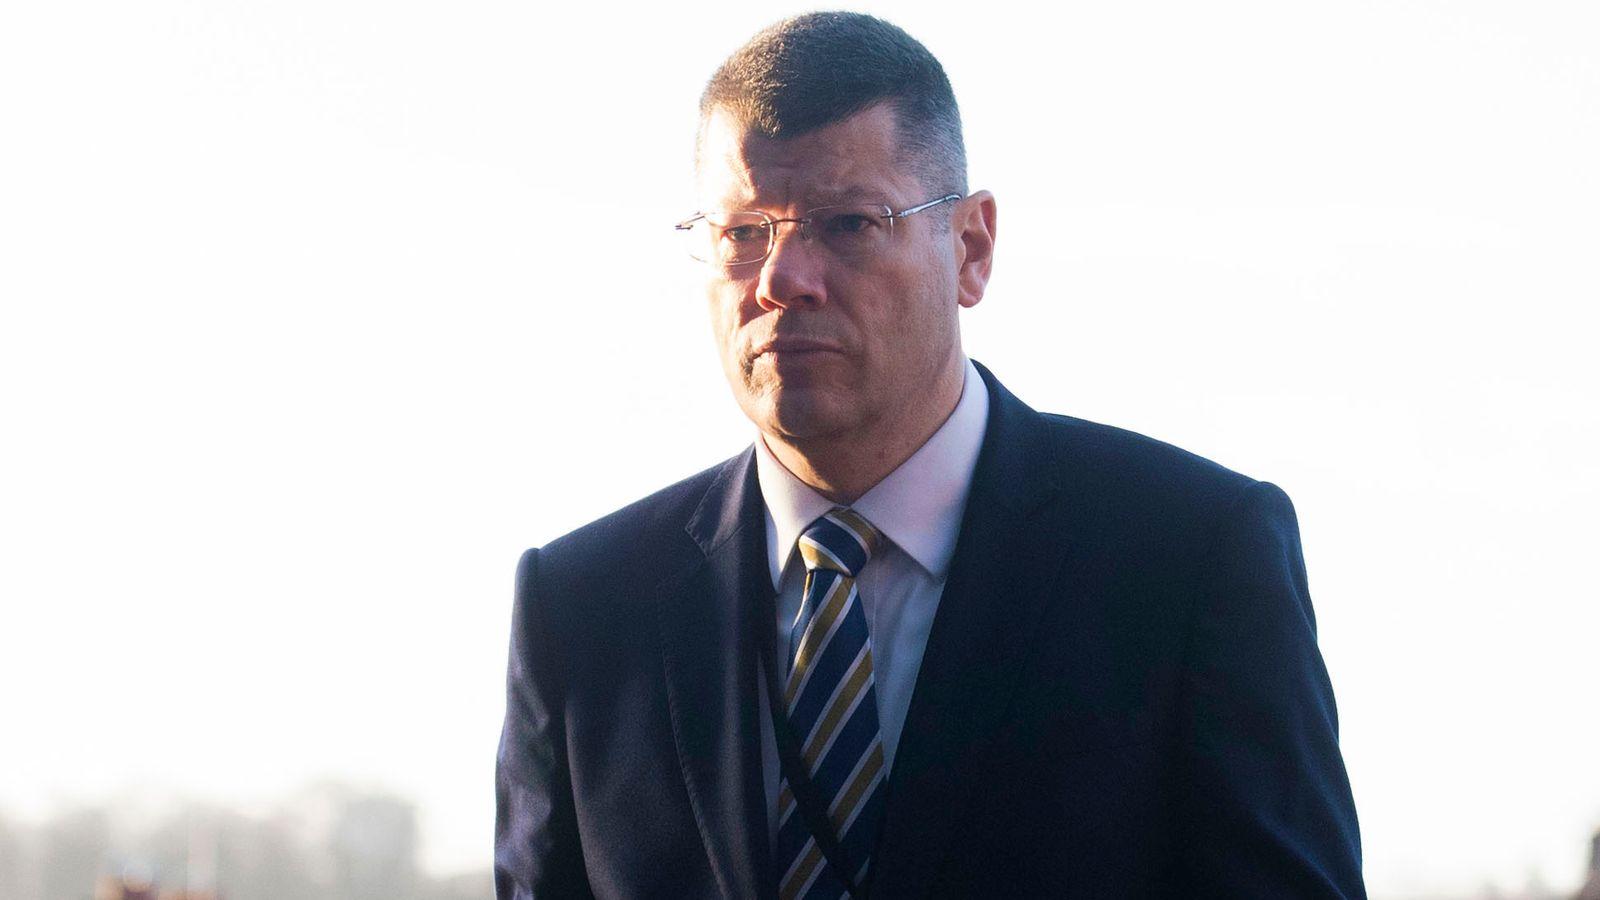 Scottish Premiership clubs could face fixture pile-up, warns Neil Doncaster